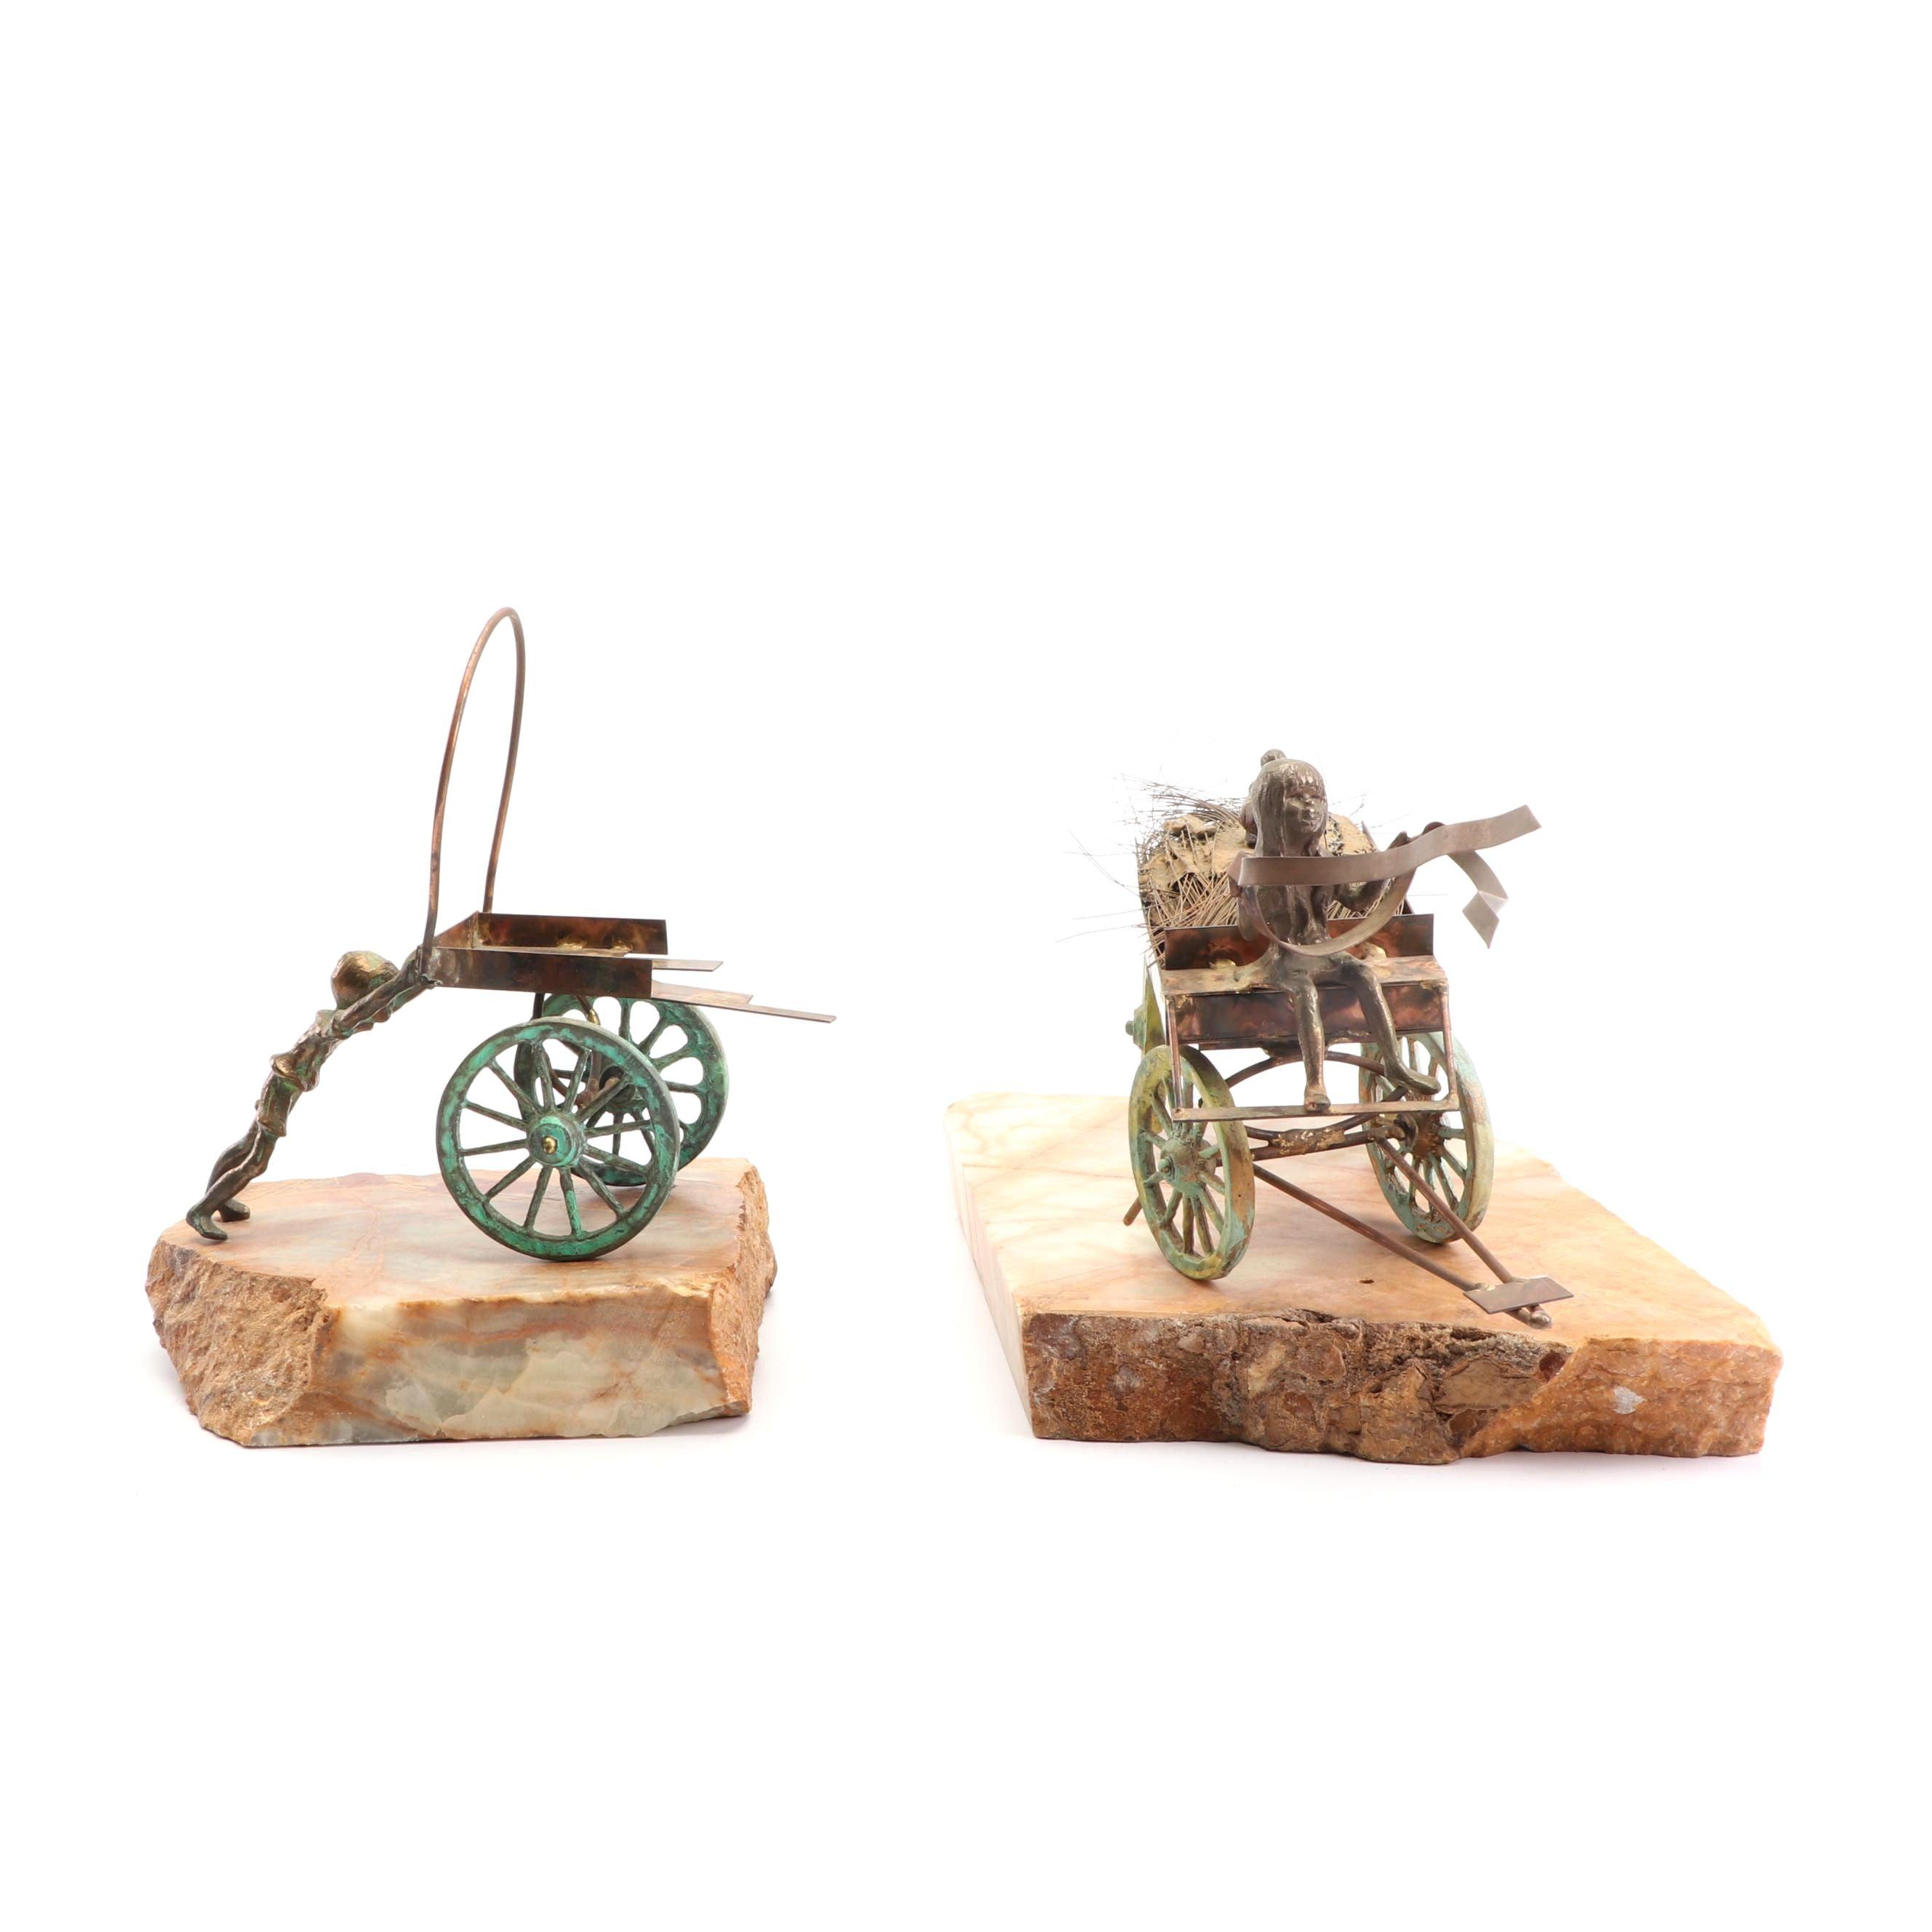 Bijan J. Bijan Brass and Copper Alloy Wagon Sculptures